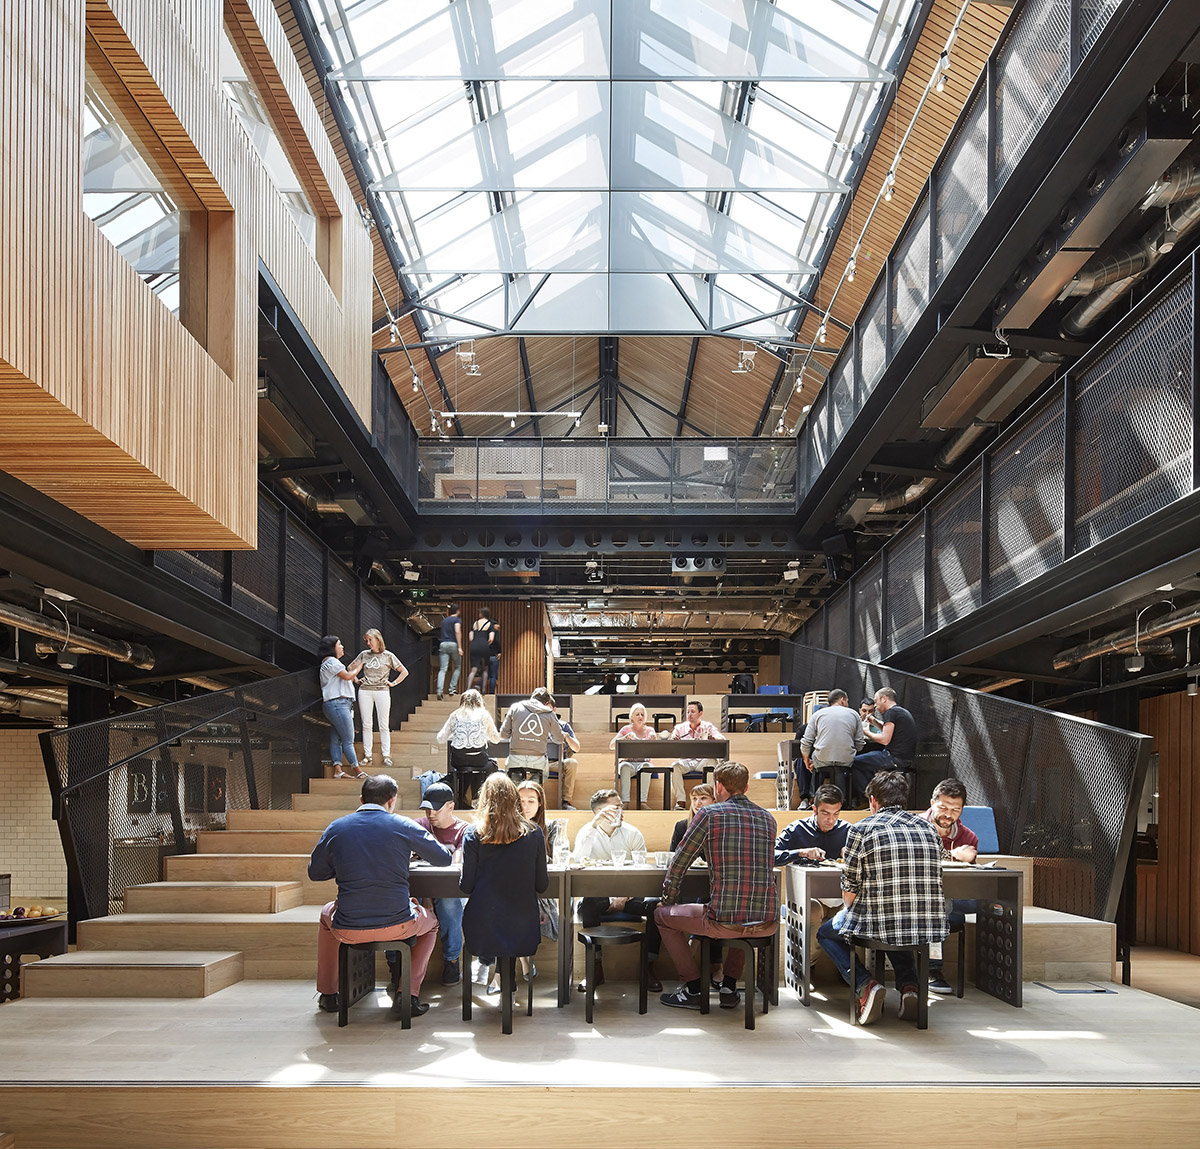 Heneghan Peng Architects Airbnb Emea Headquarters Dublin